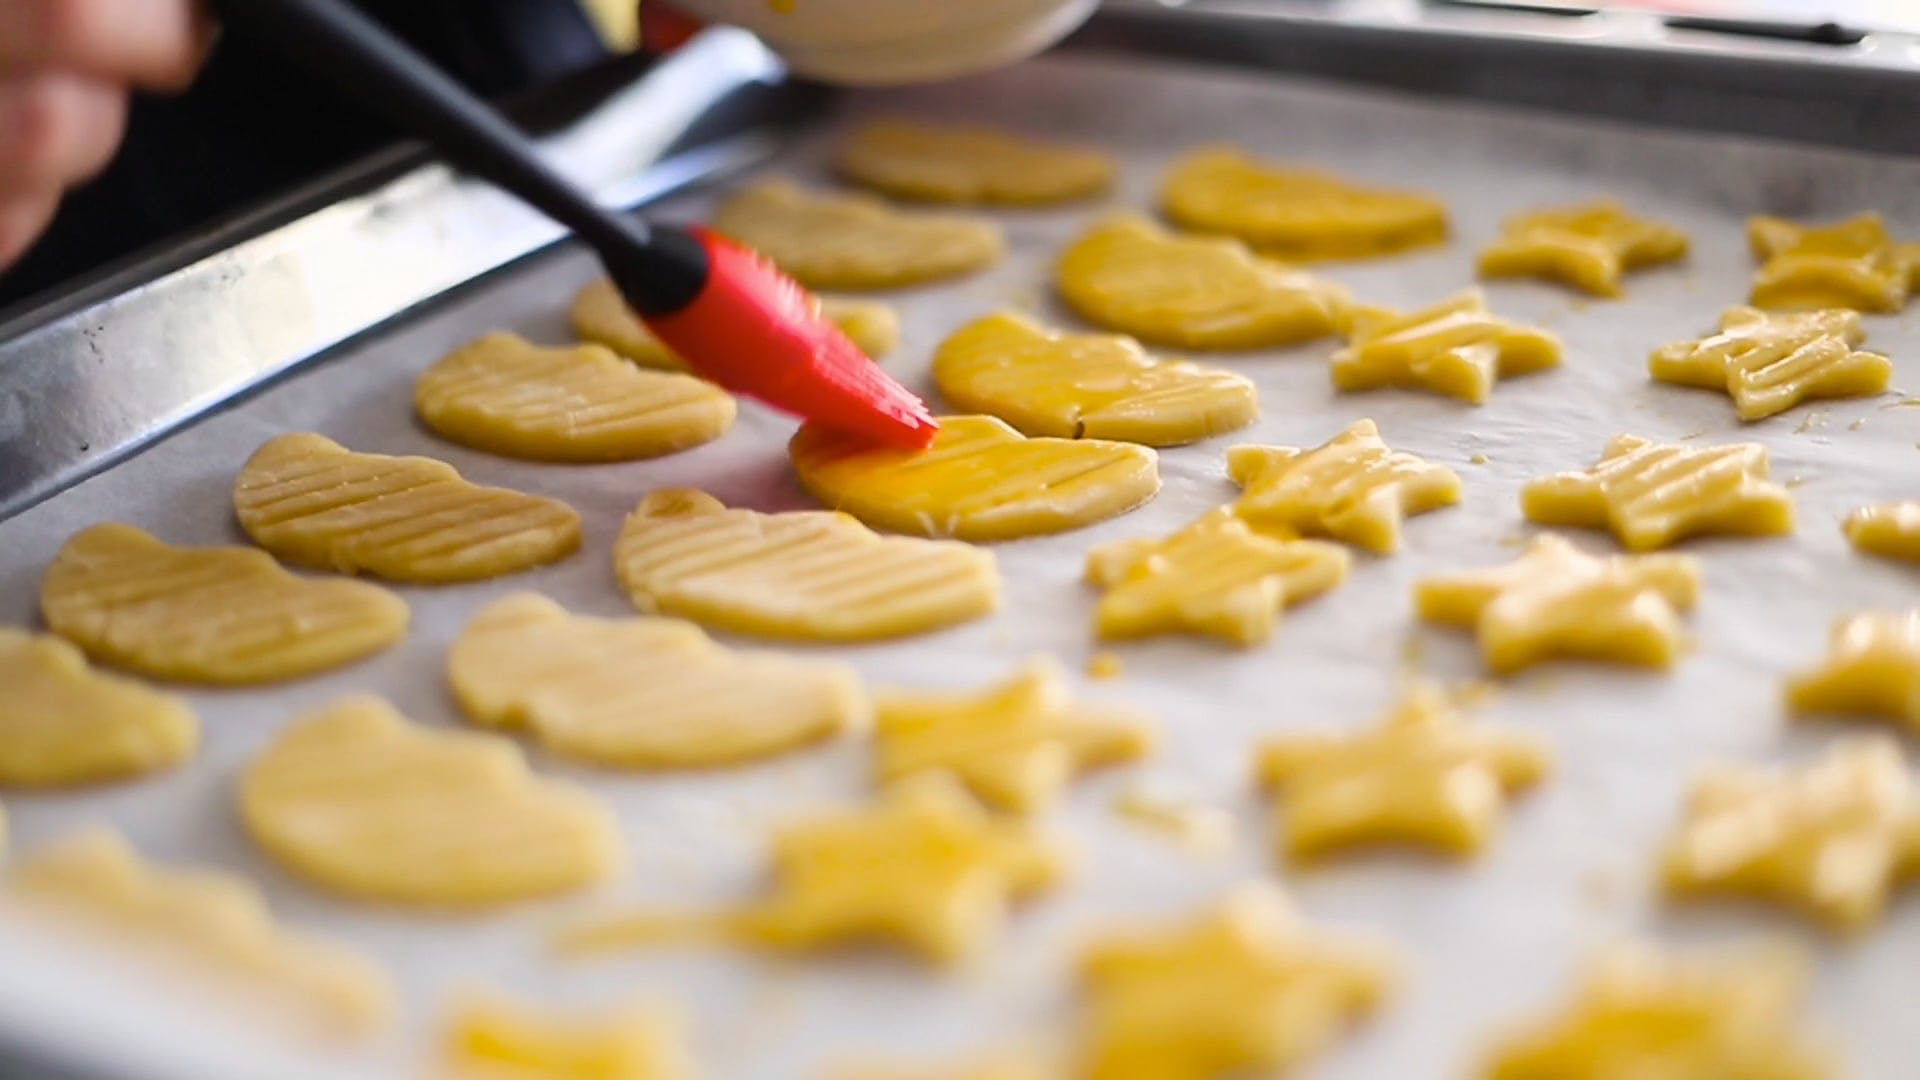 Person Preparing To Bake Cookies